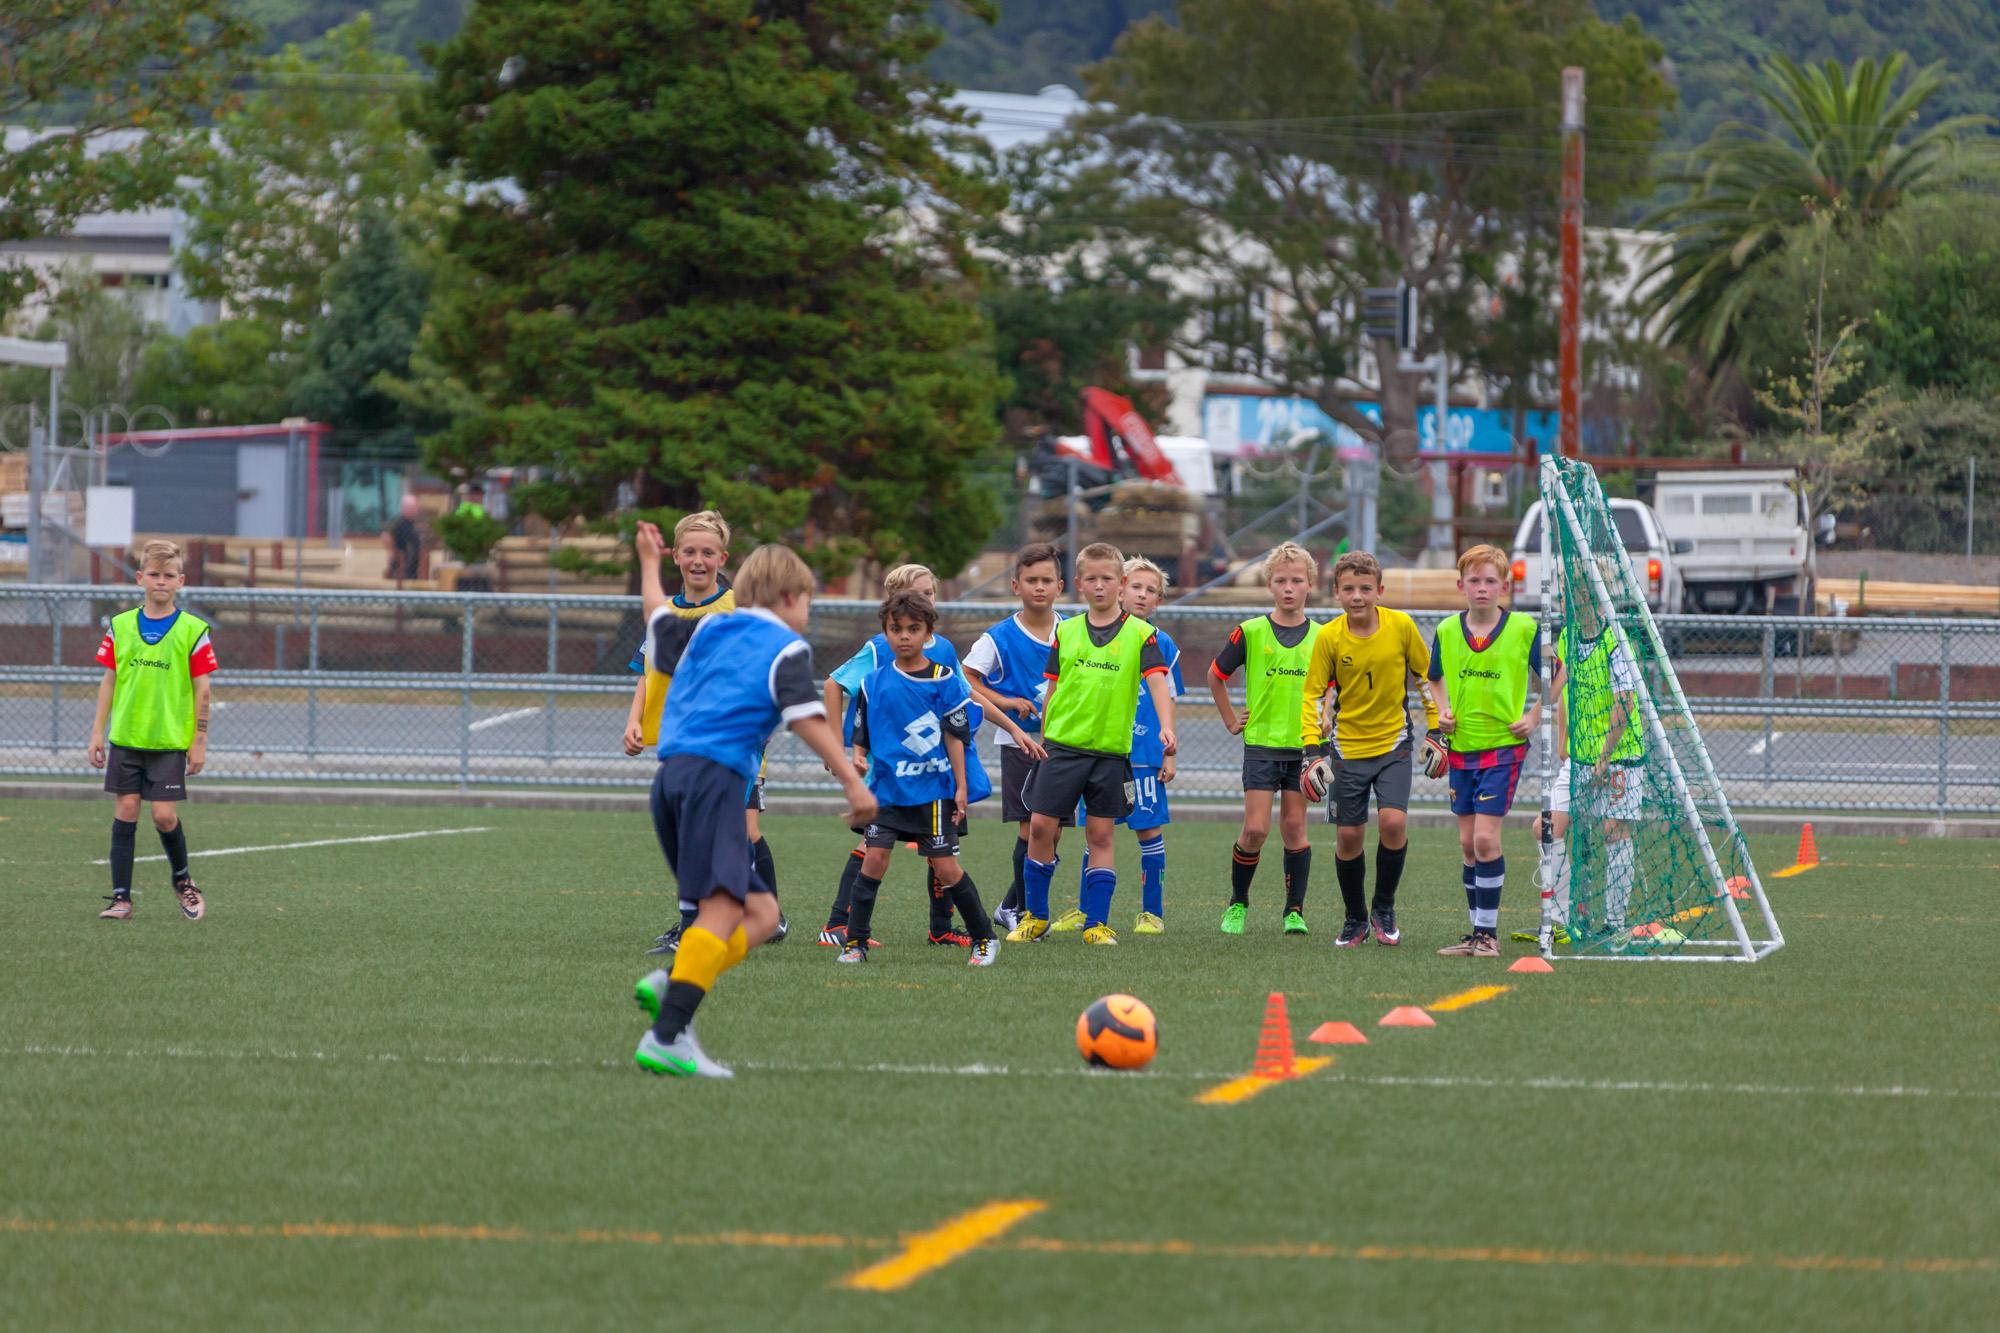 UHCC Soccer Coach 4457